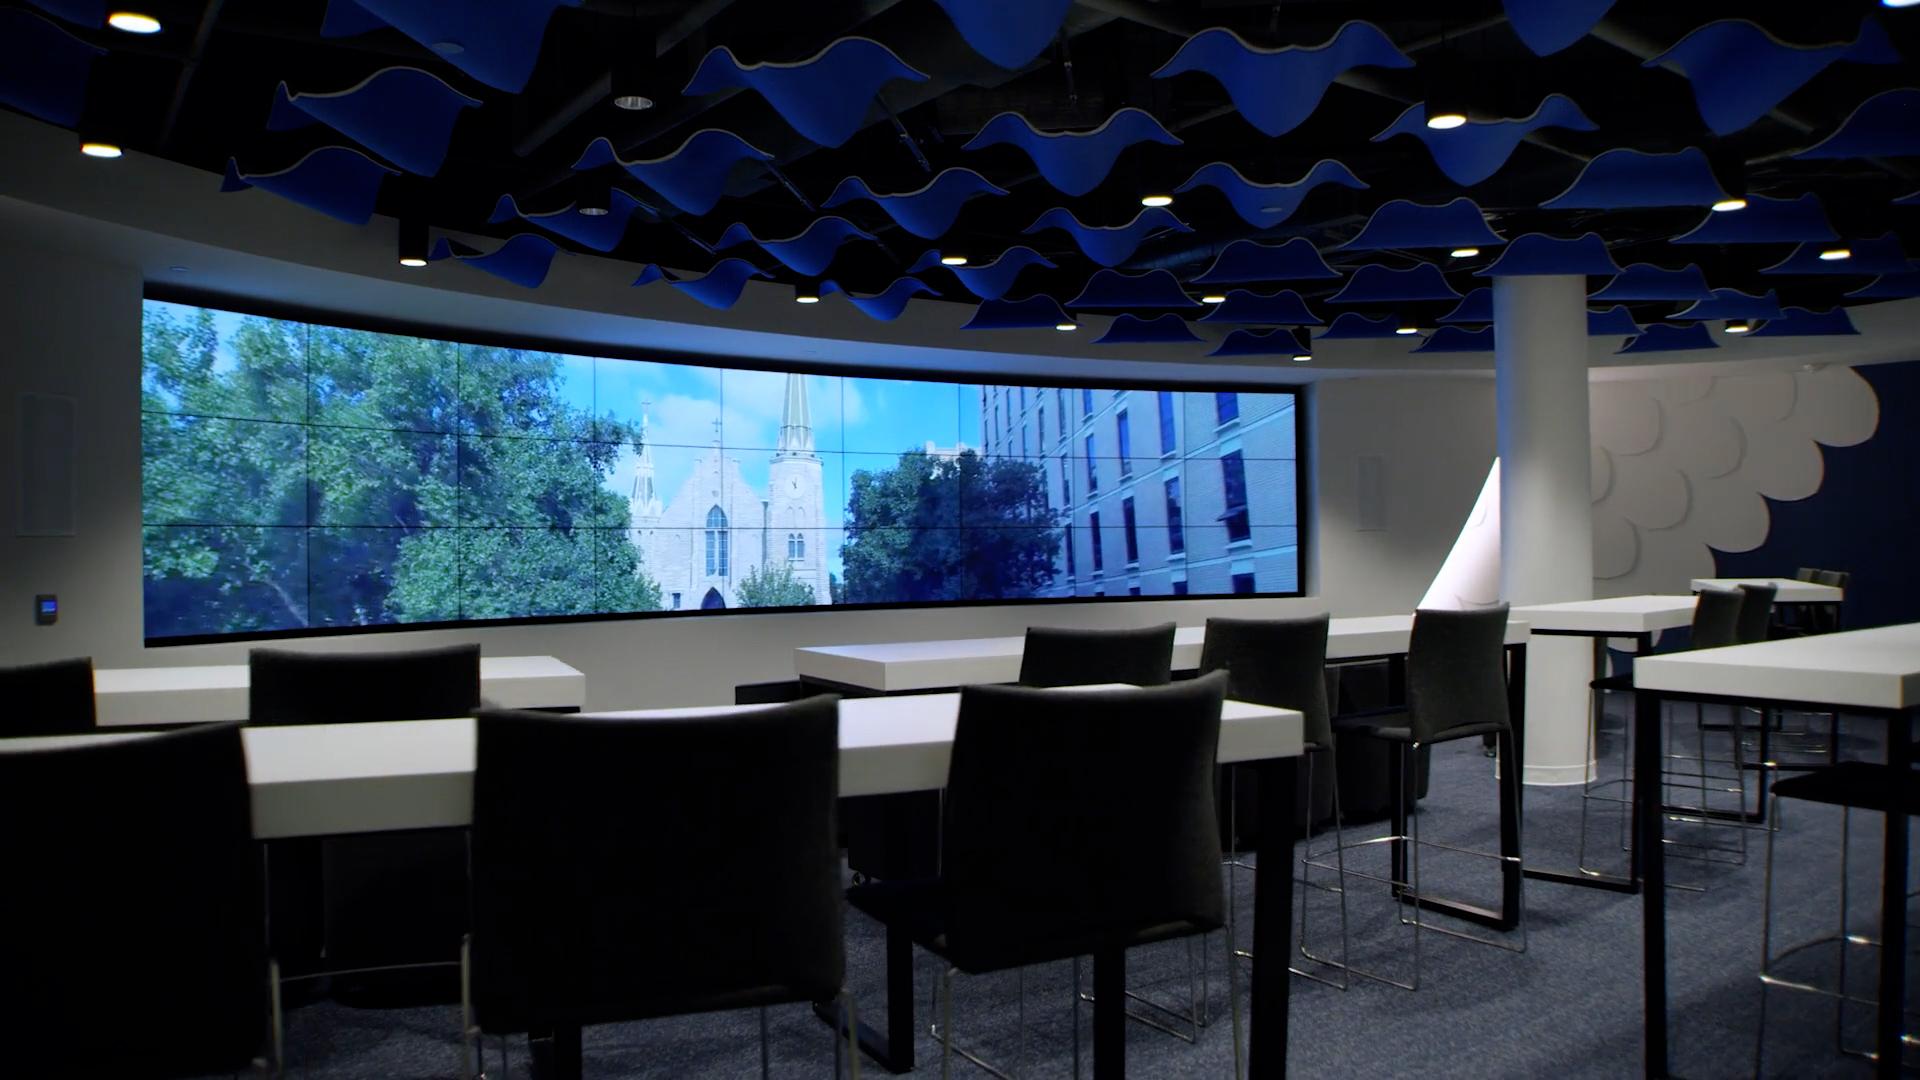 Creighton Univeristy Video Admissions Room